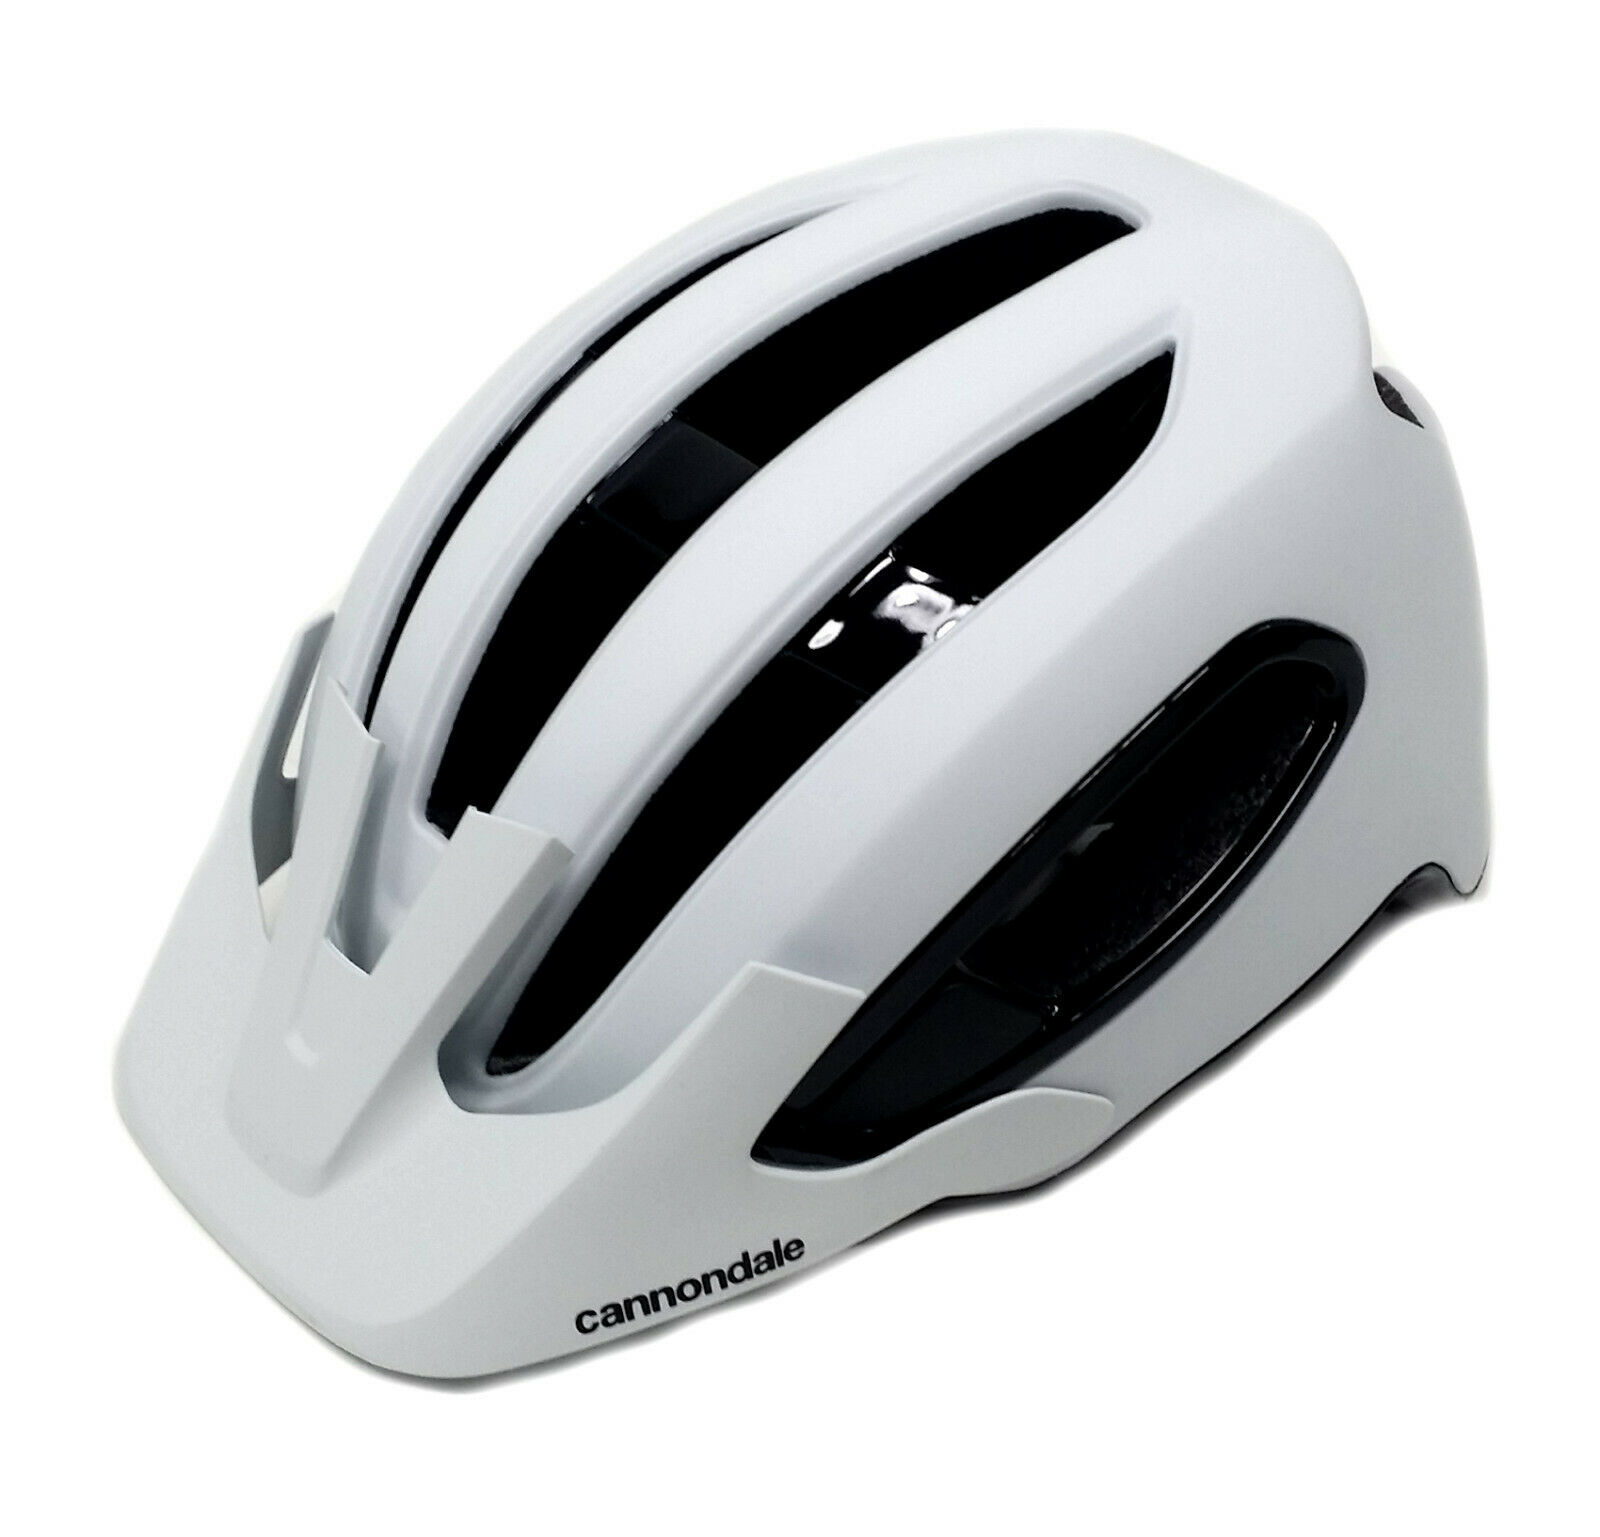 Cannondale CASCO Para Ciclismo Hunter, blancoo, Pequeño mediano, 54-58cm